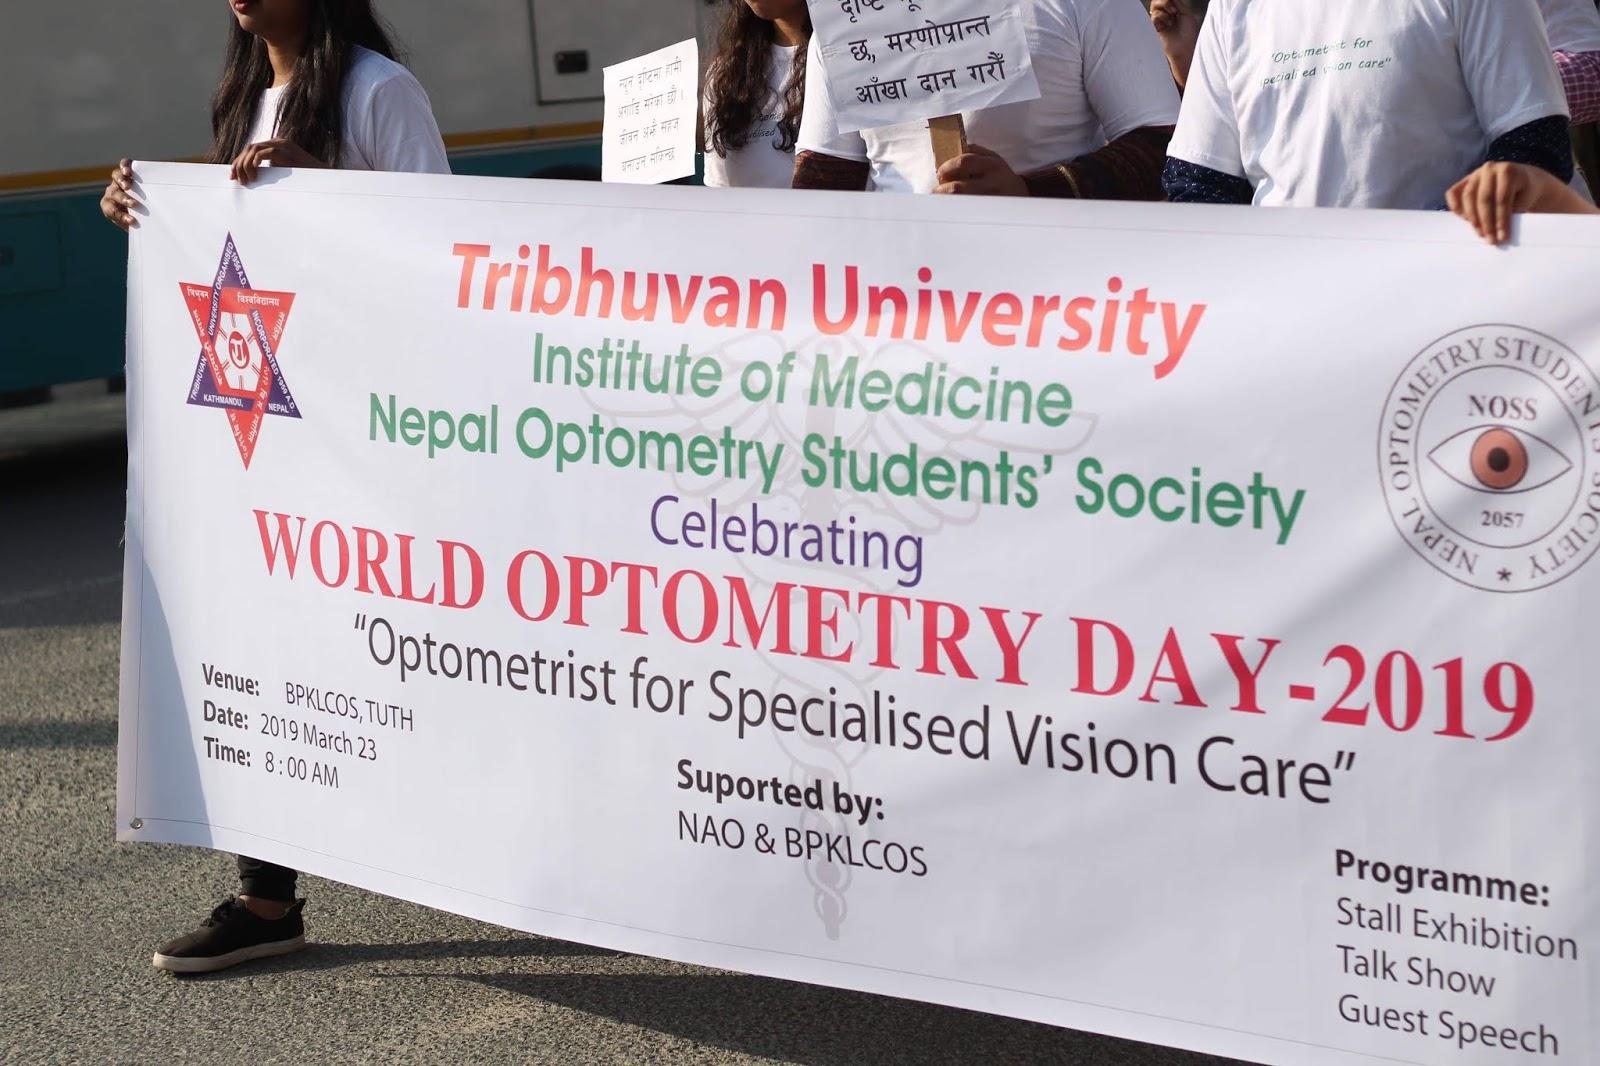 World Optometry Day Celebrations in Nepal - Eye Health Nepal